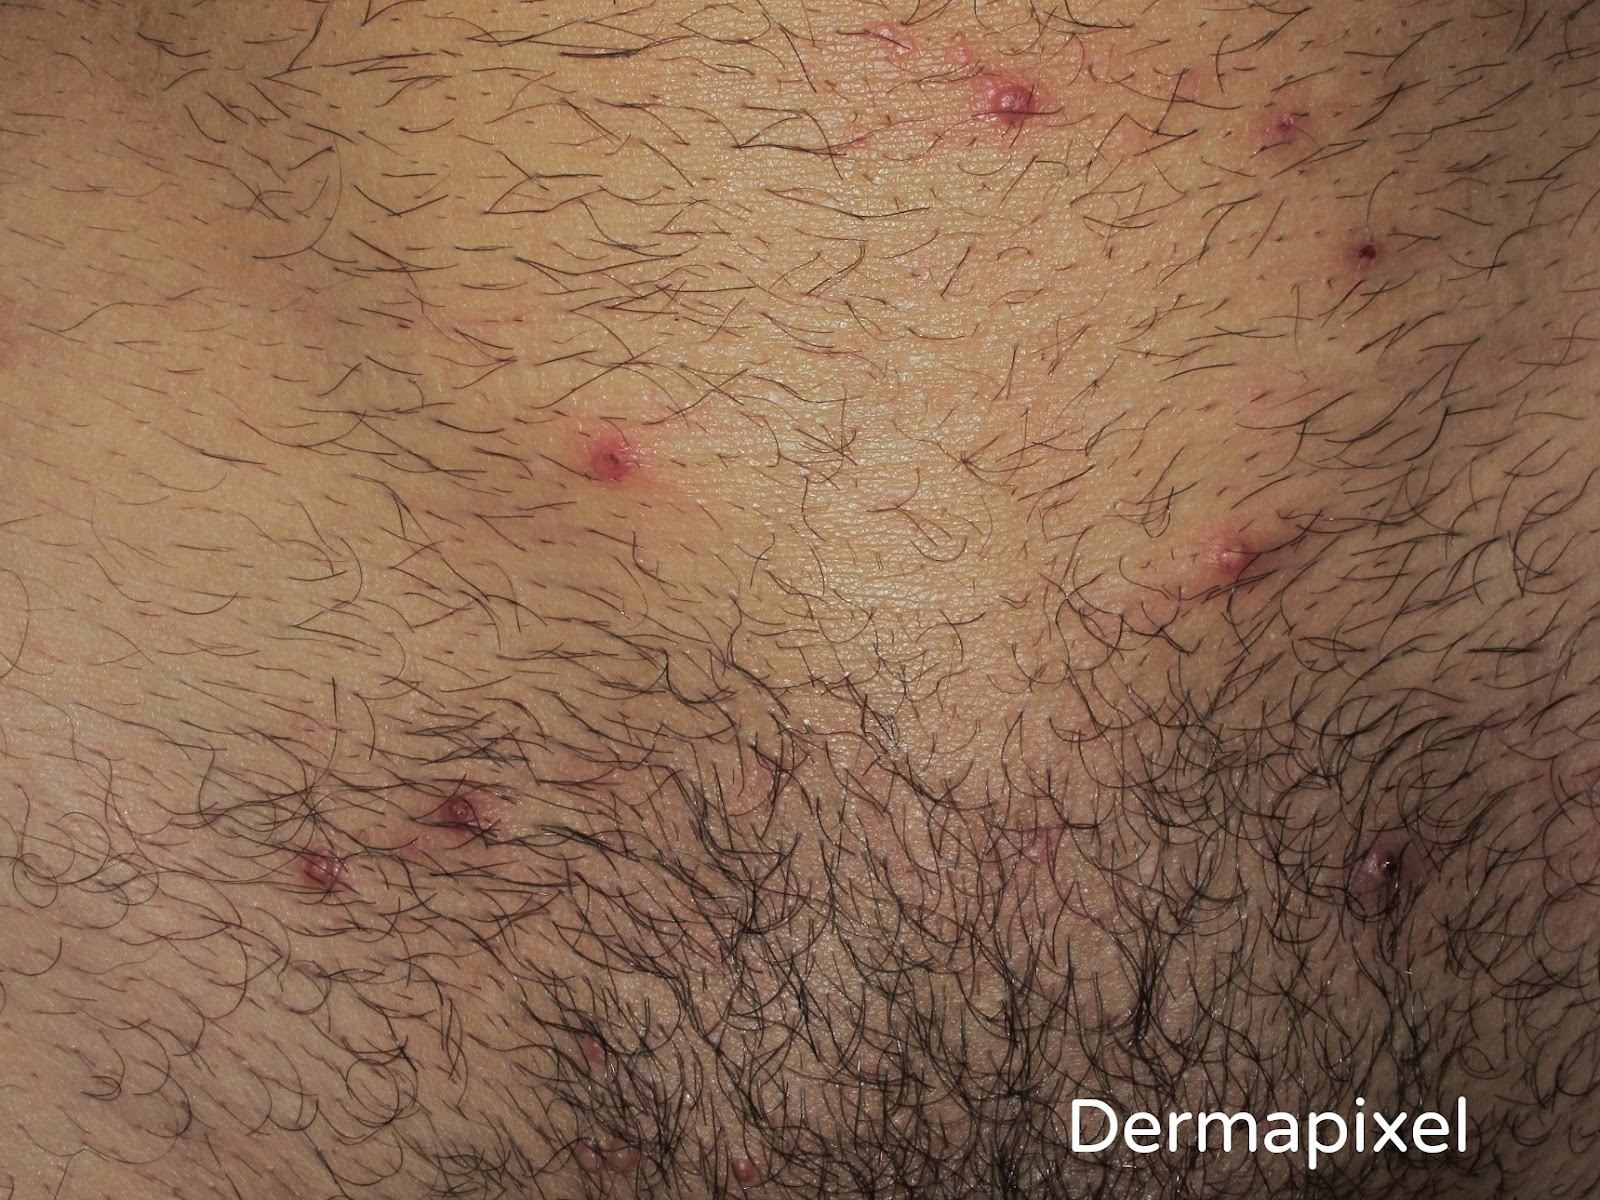 papilloma virus contagio piscina